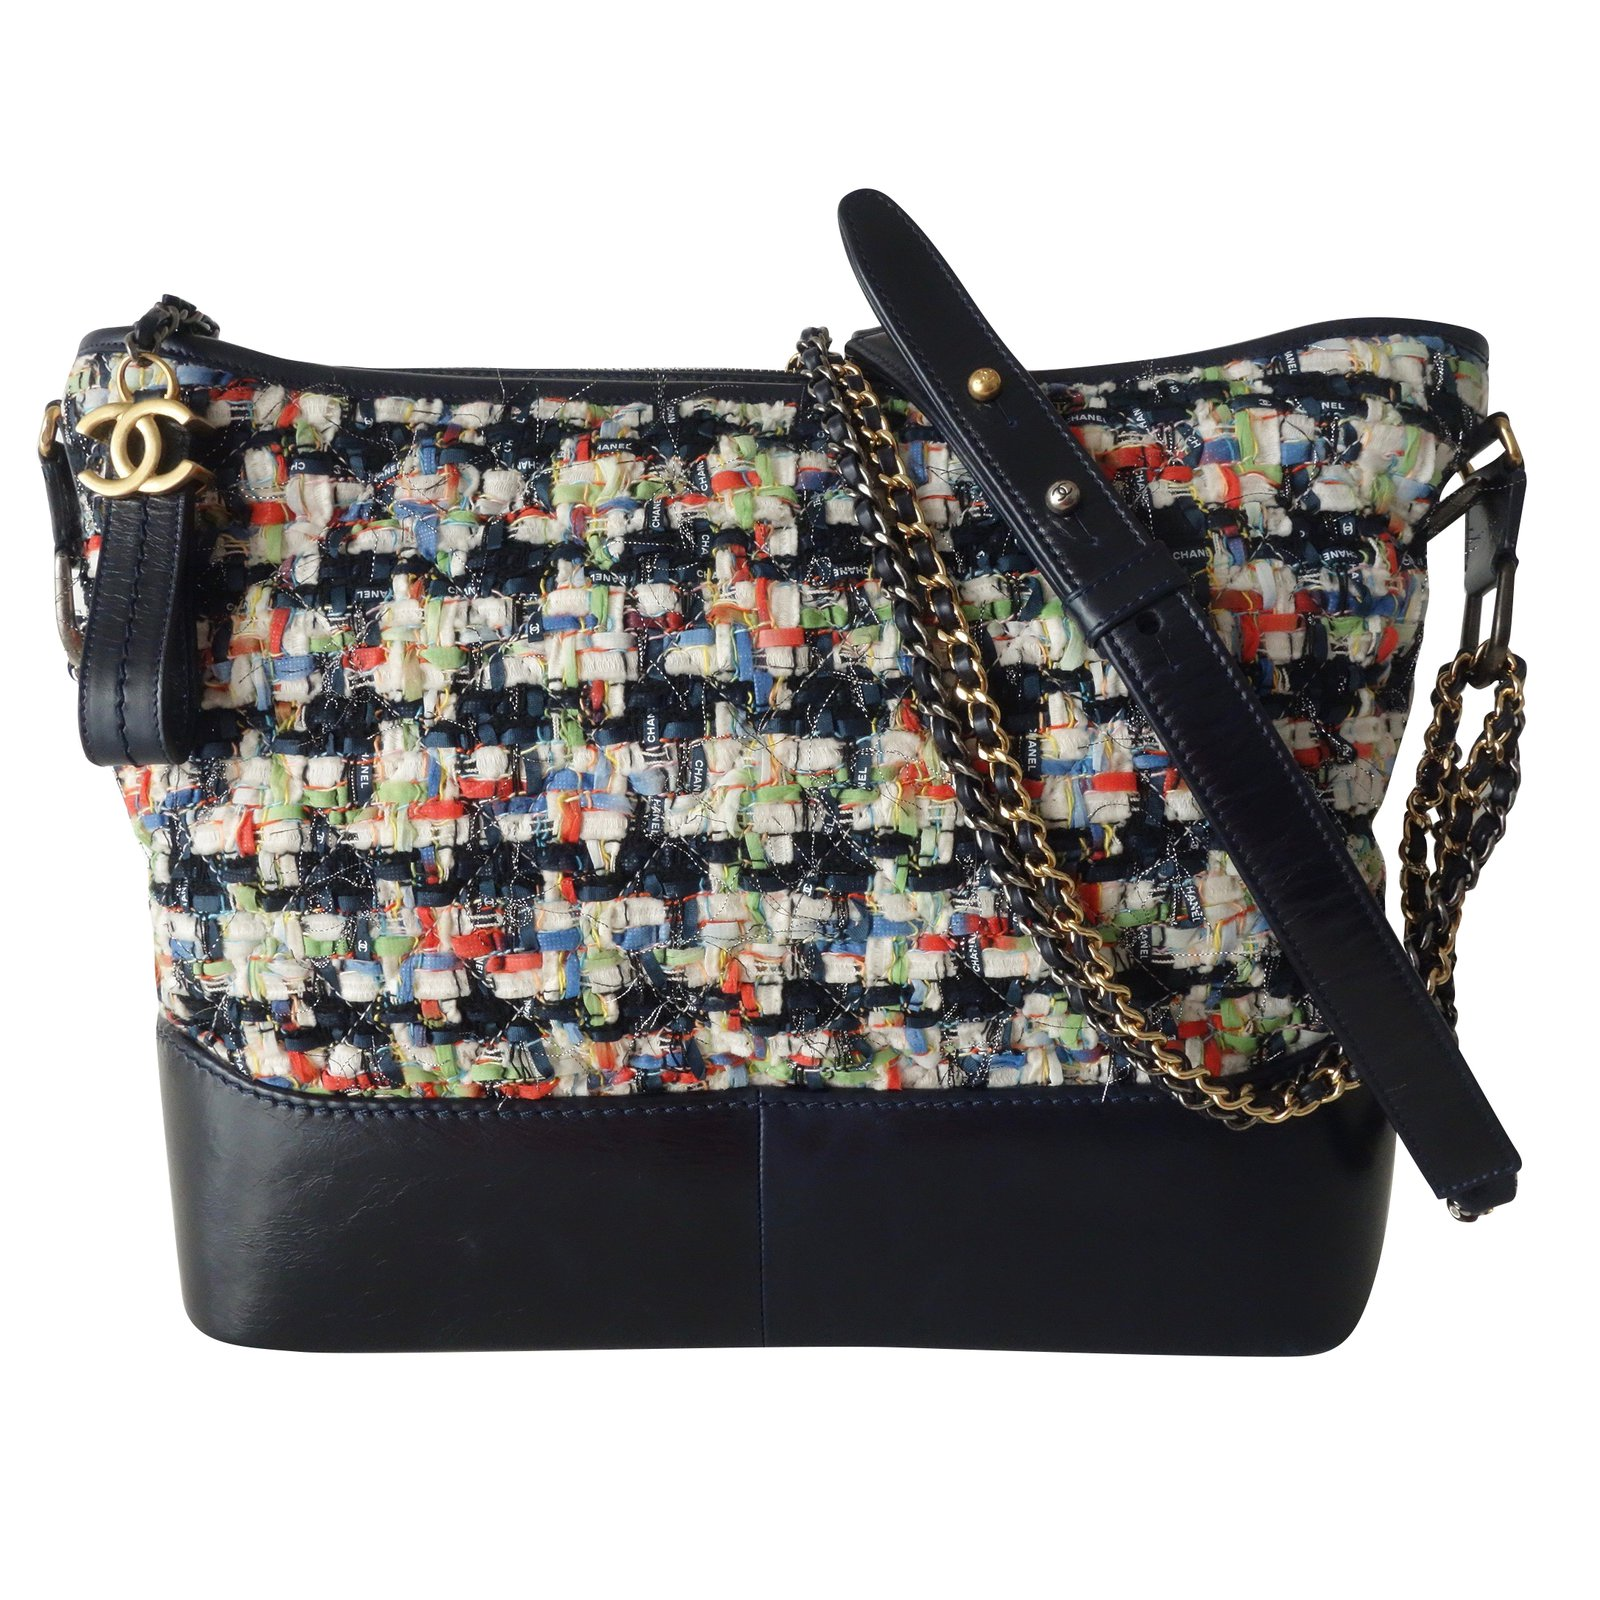 e648945b34 Chanel GABRIELLE Handbags Leather,Tweed Blue,Multiple colors ref.89689